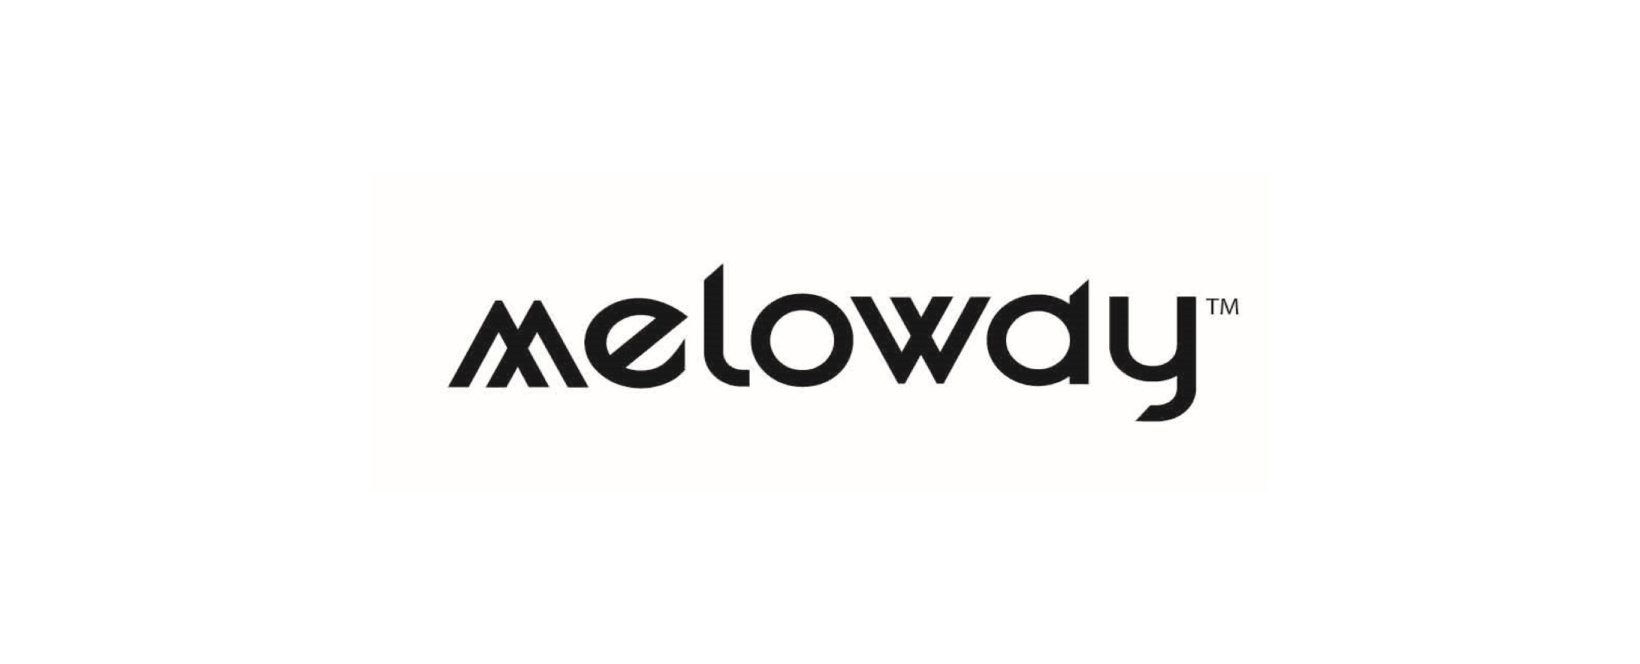 Meloway Makeup Discount Code 2021